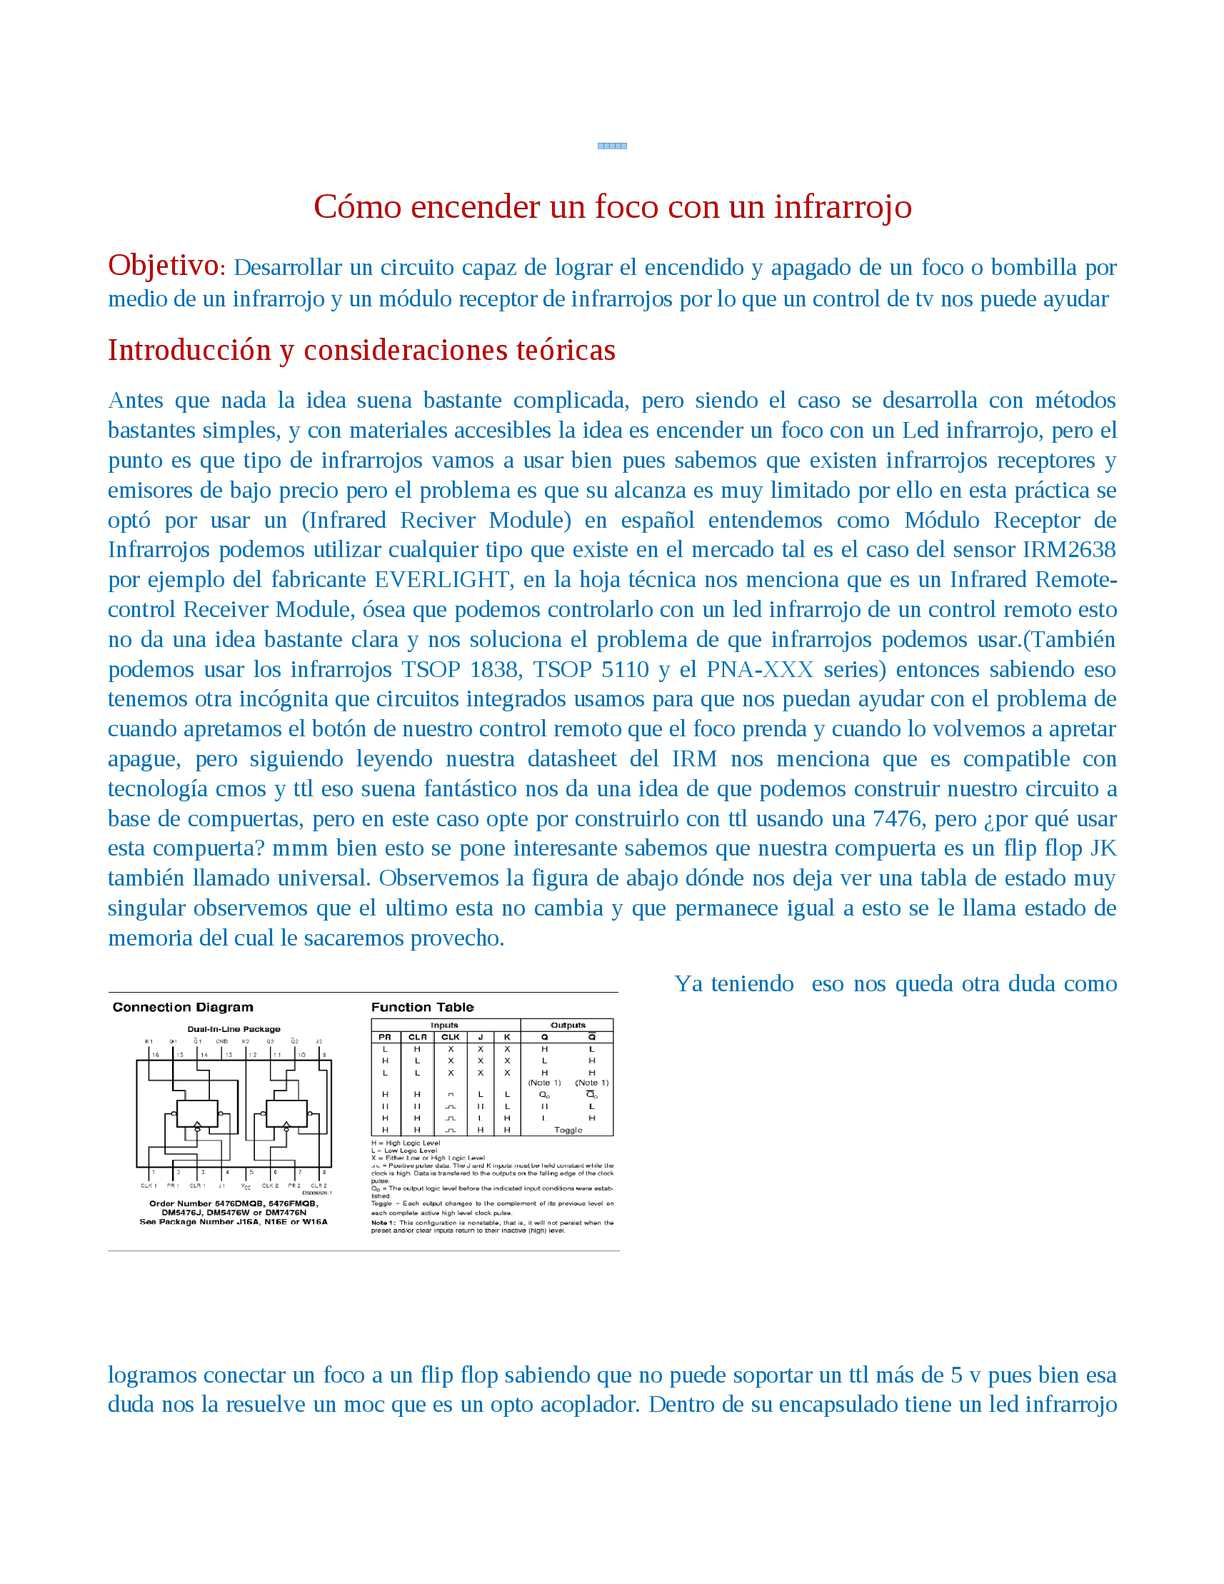 Circuito Optoacoplador : Calaméo encender foco con infrarrojo